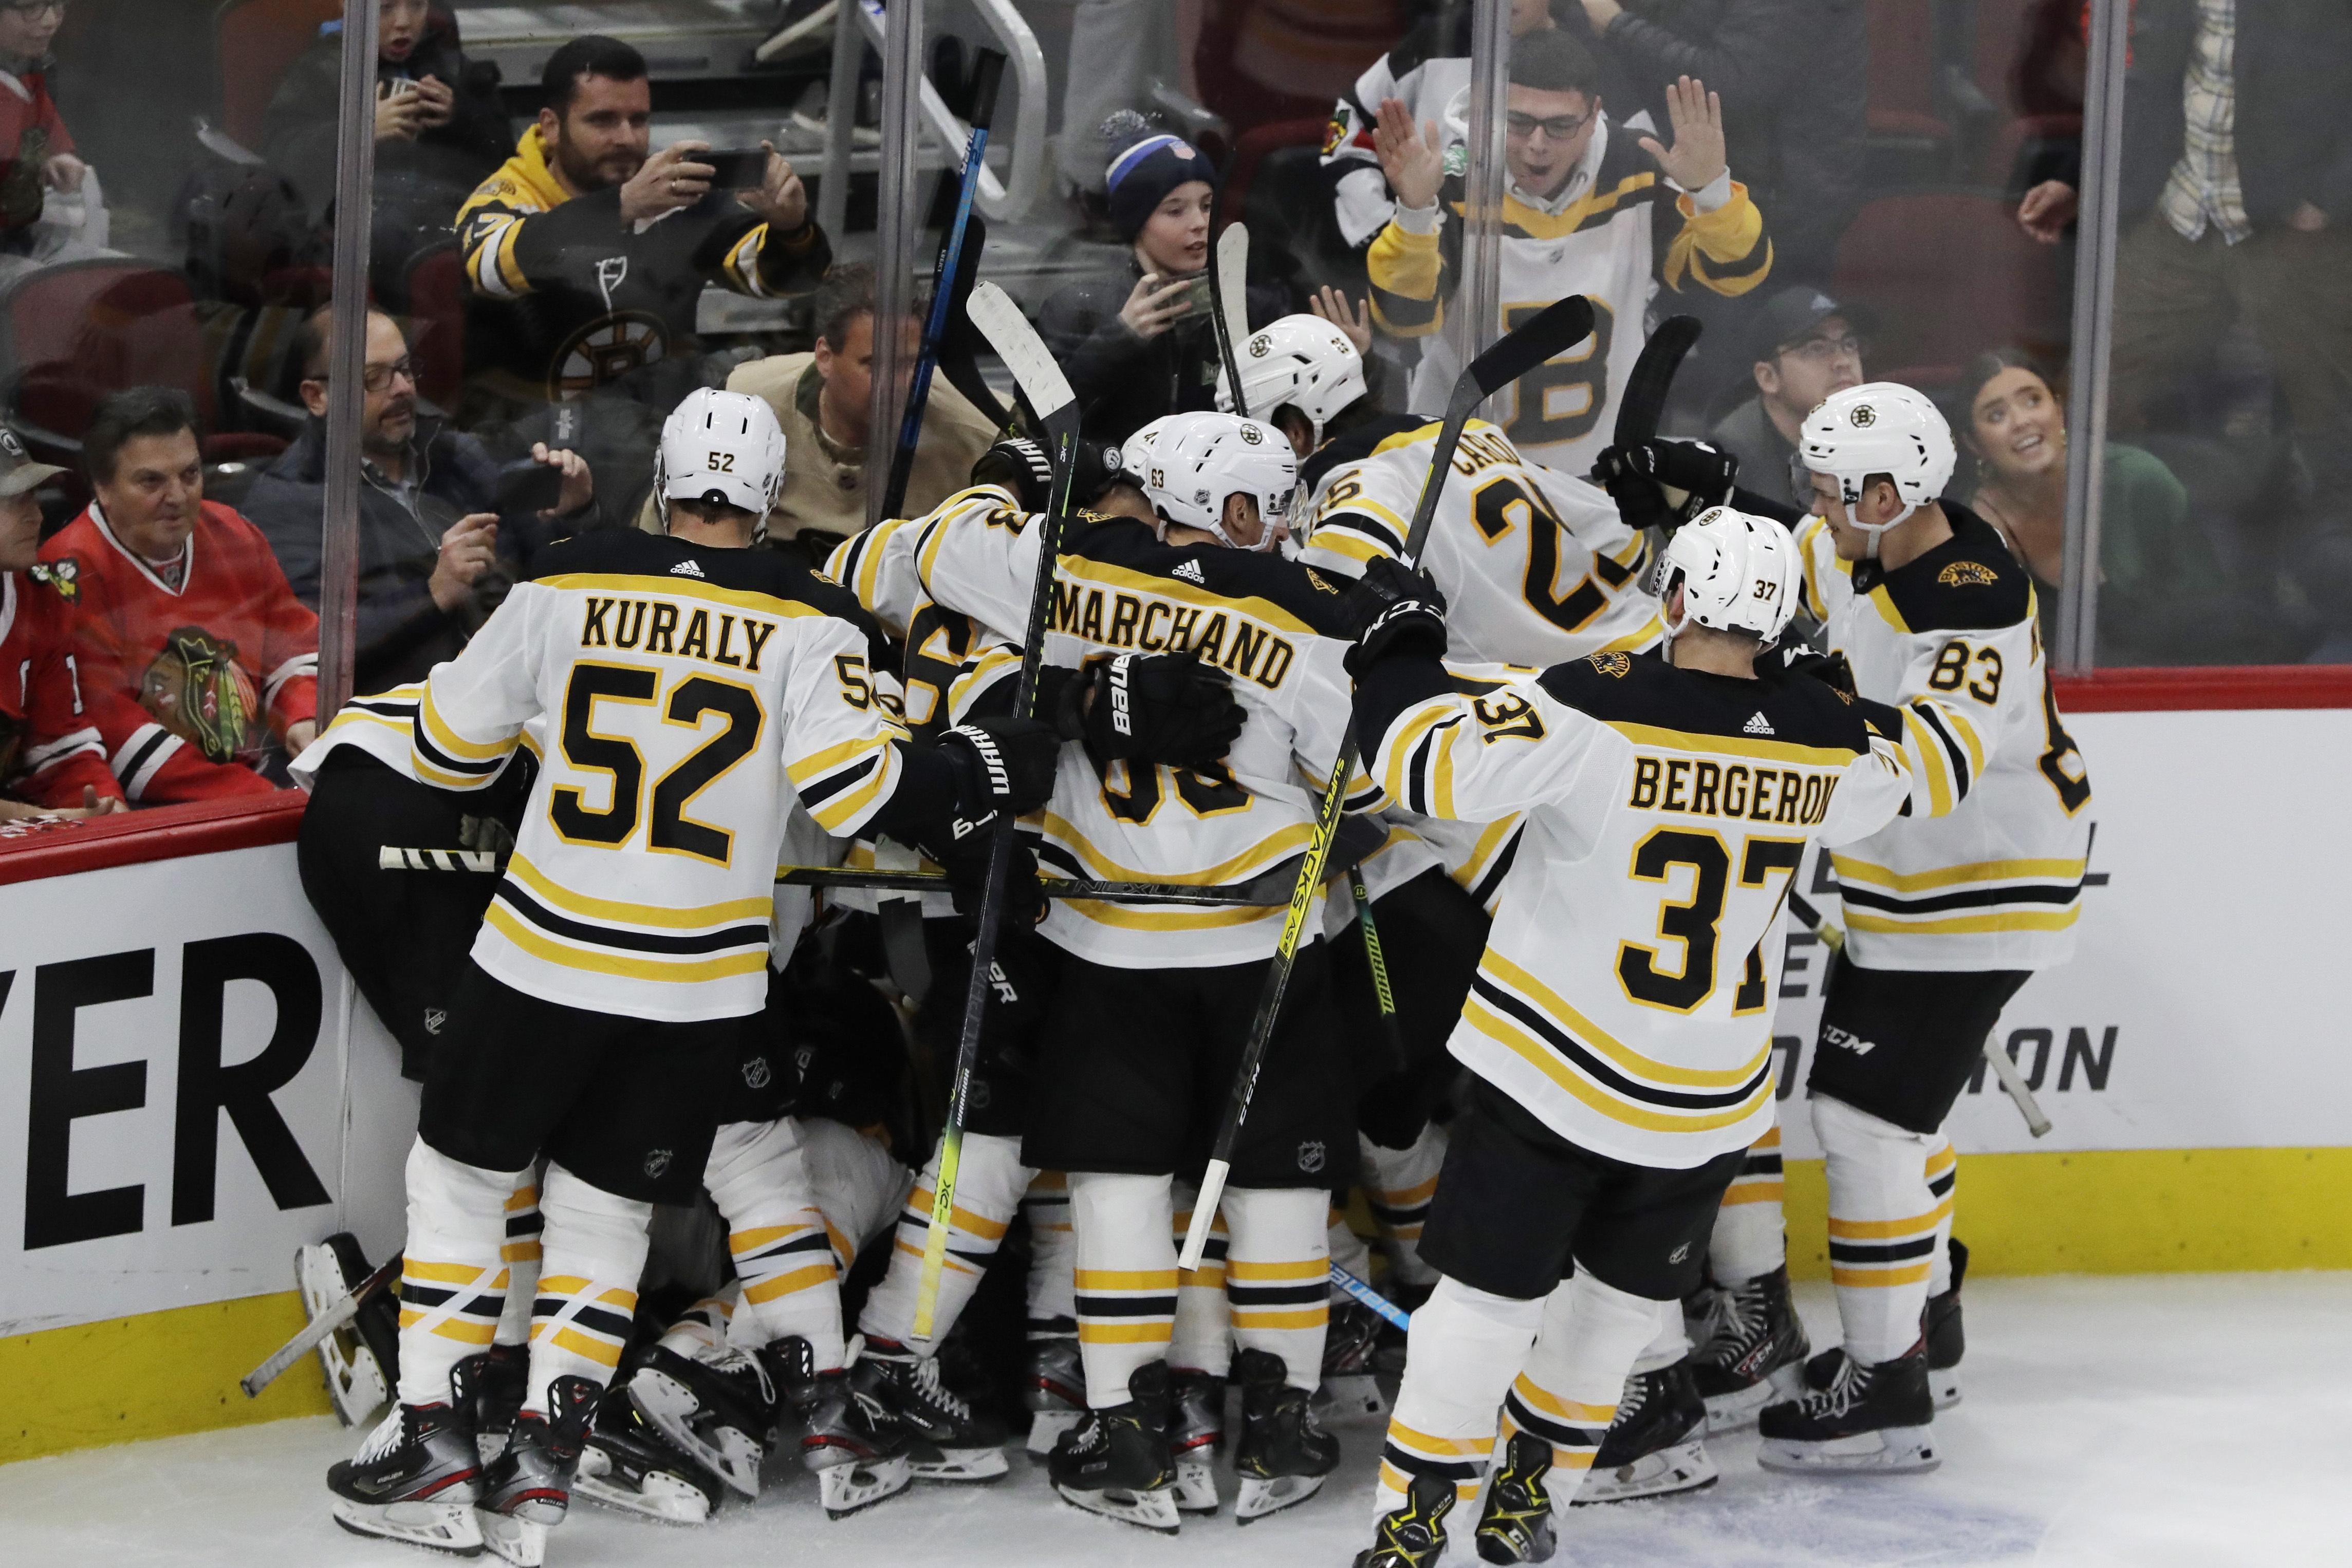 McAvoy lifts Bruins past Blackhawks in OT